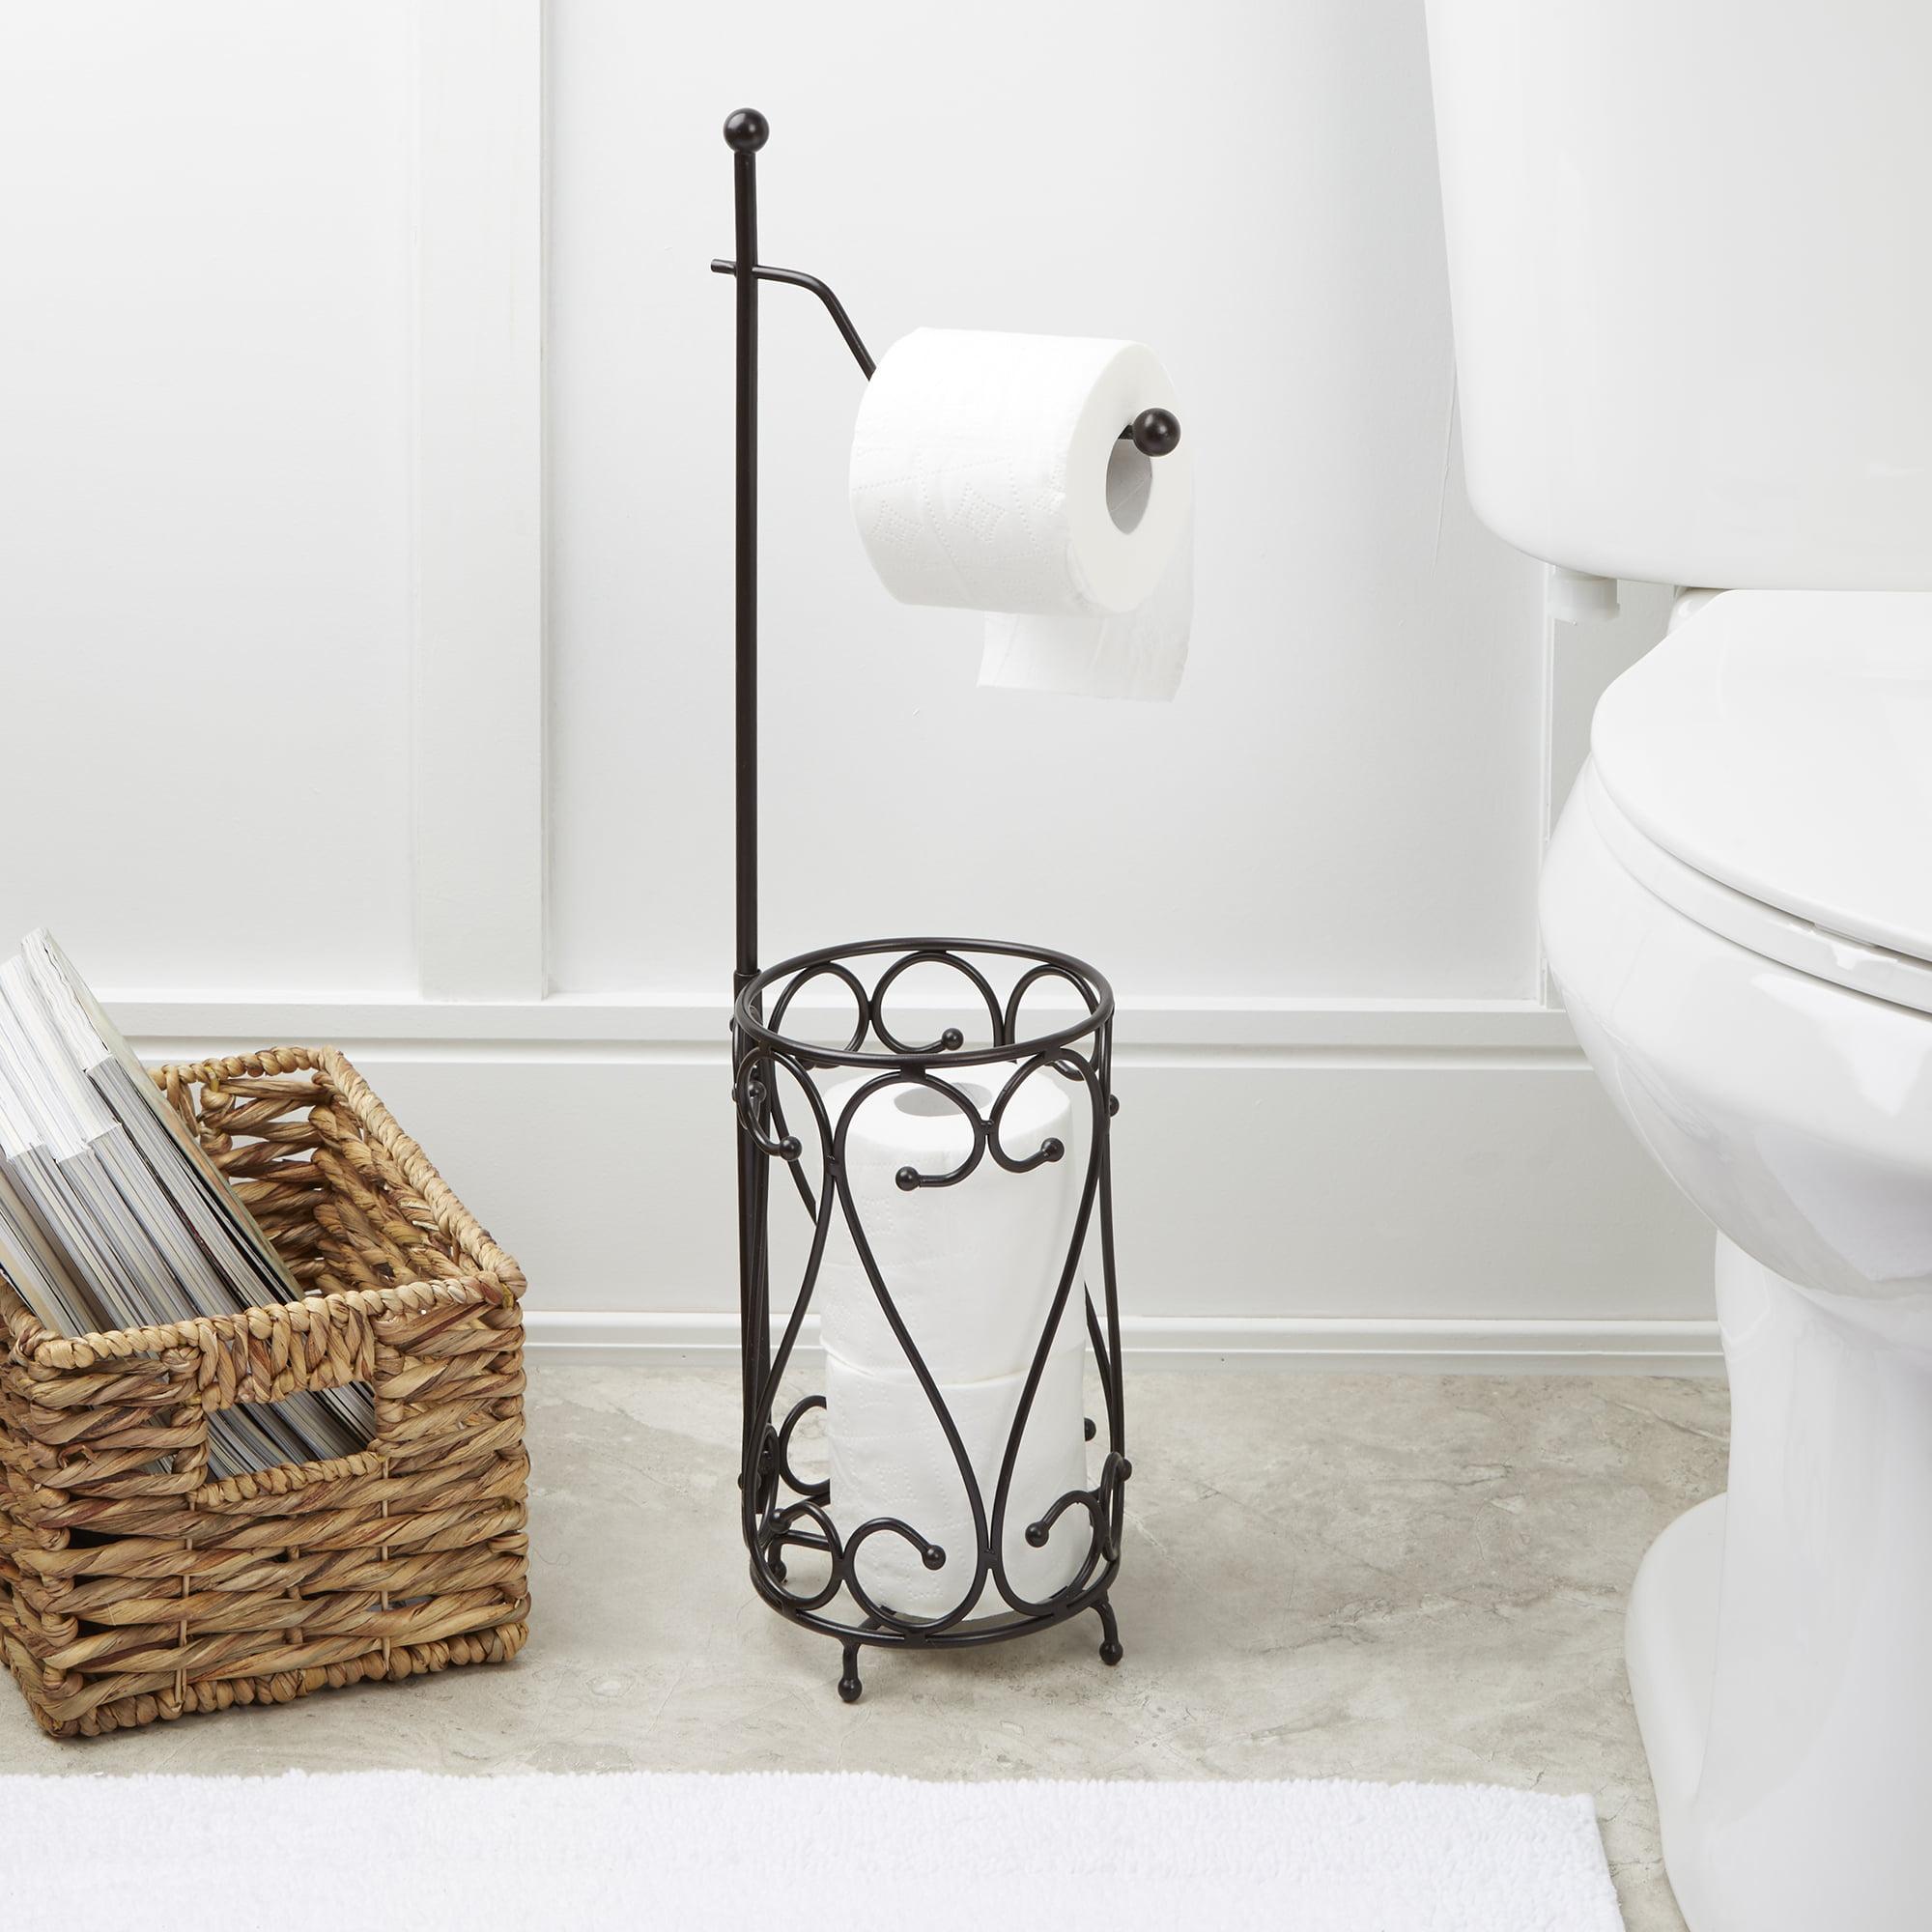 Bath Bliss Chrome Toilet Paper Holder - Walmart.com